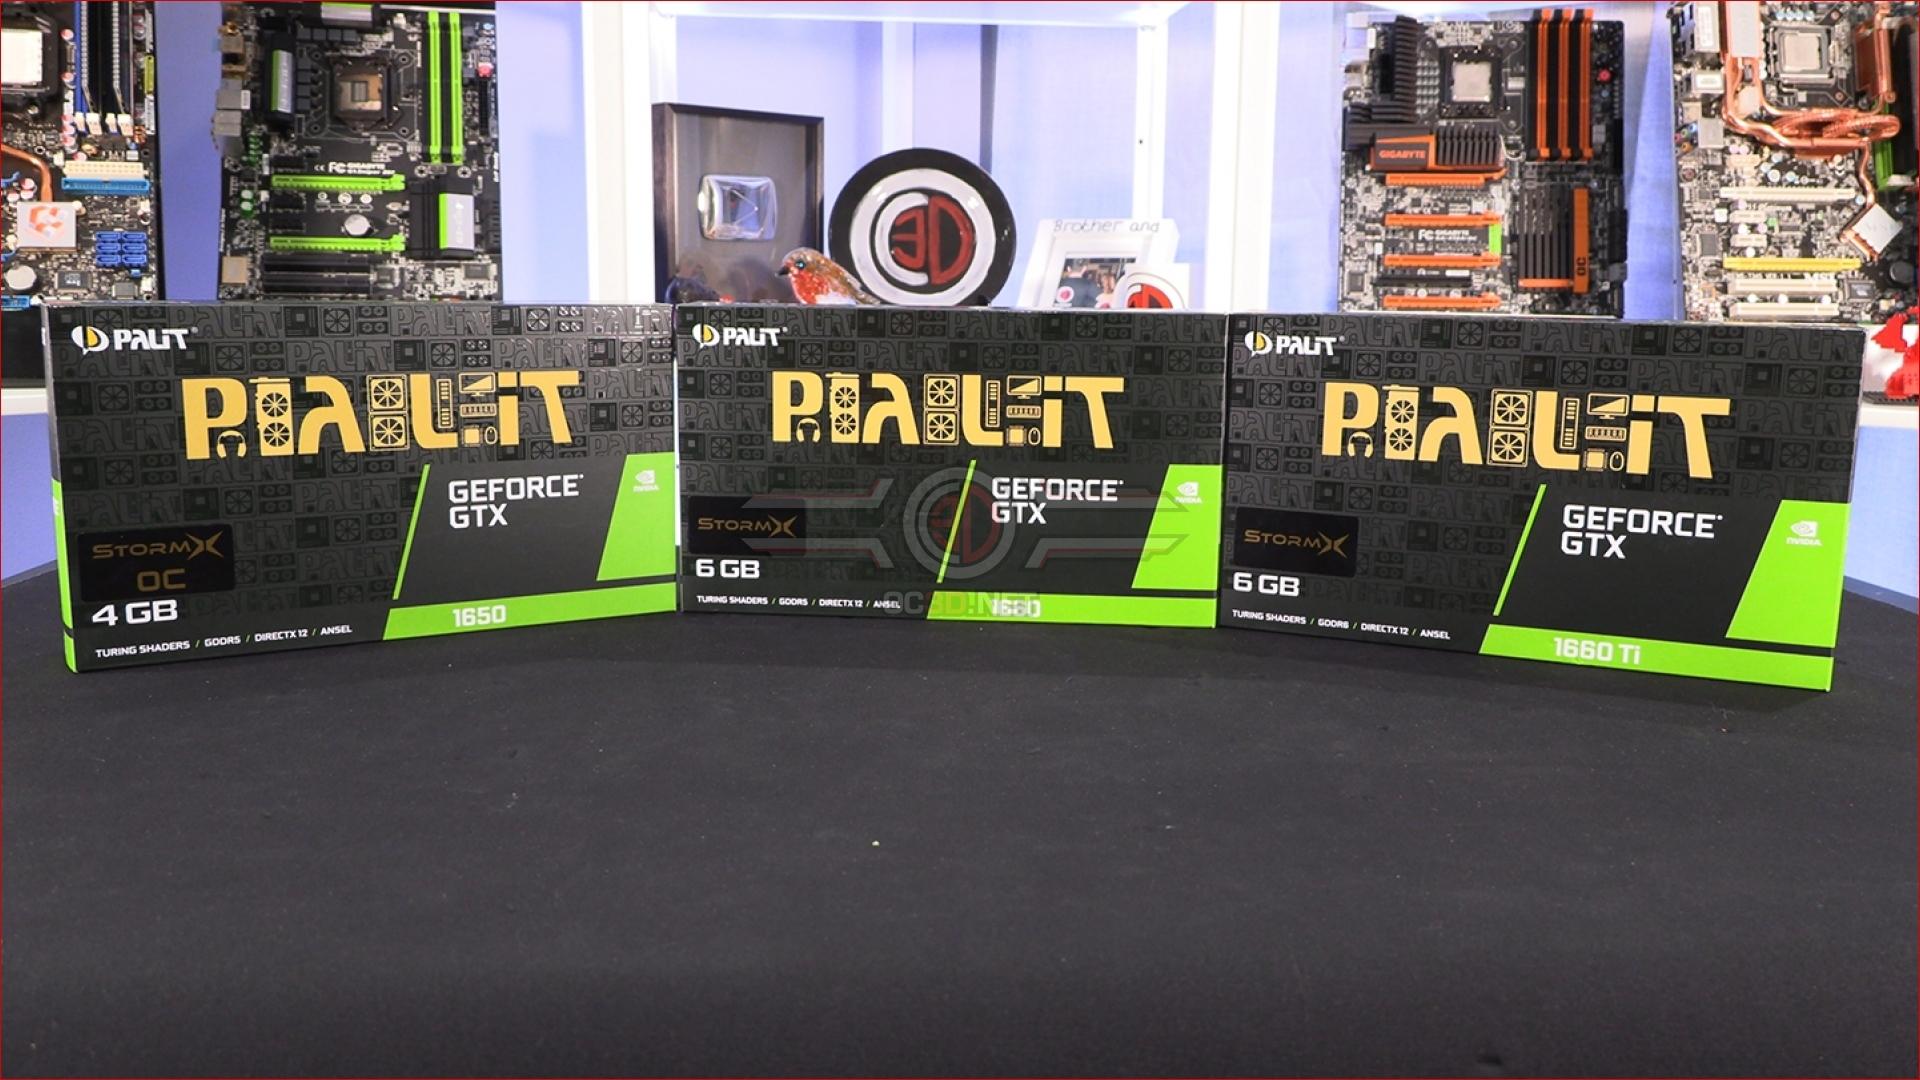 Palit GTX 1650, 1660 and 1660 Ti StormX Review Roundup | Up